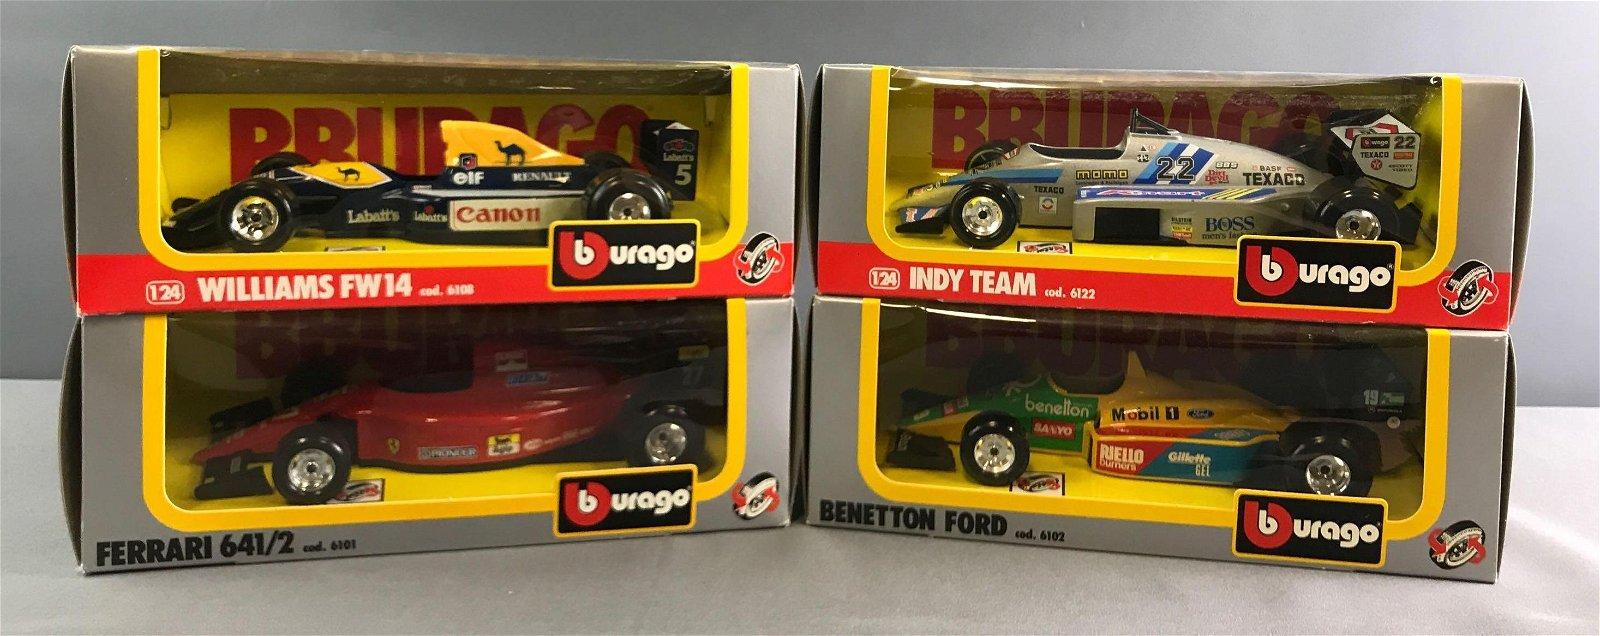 Group of 4 Burago Model Racing Cars